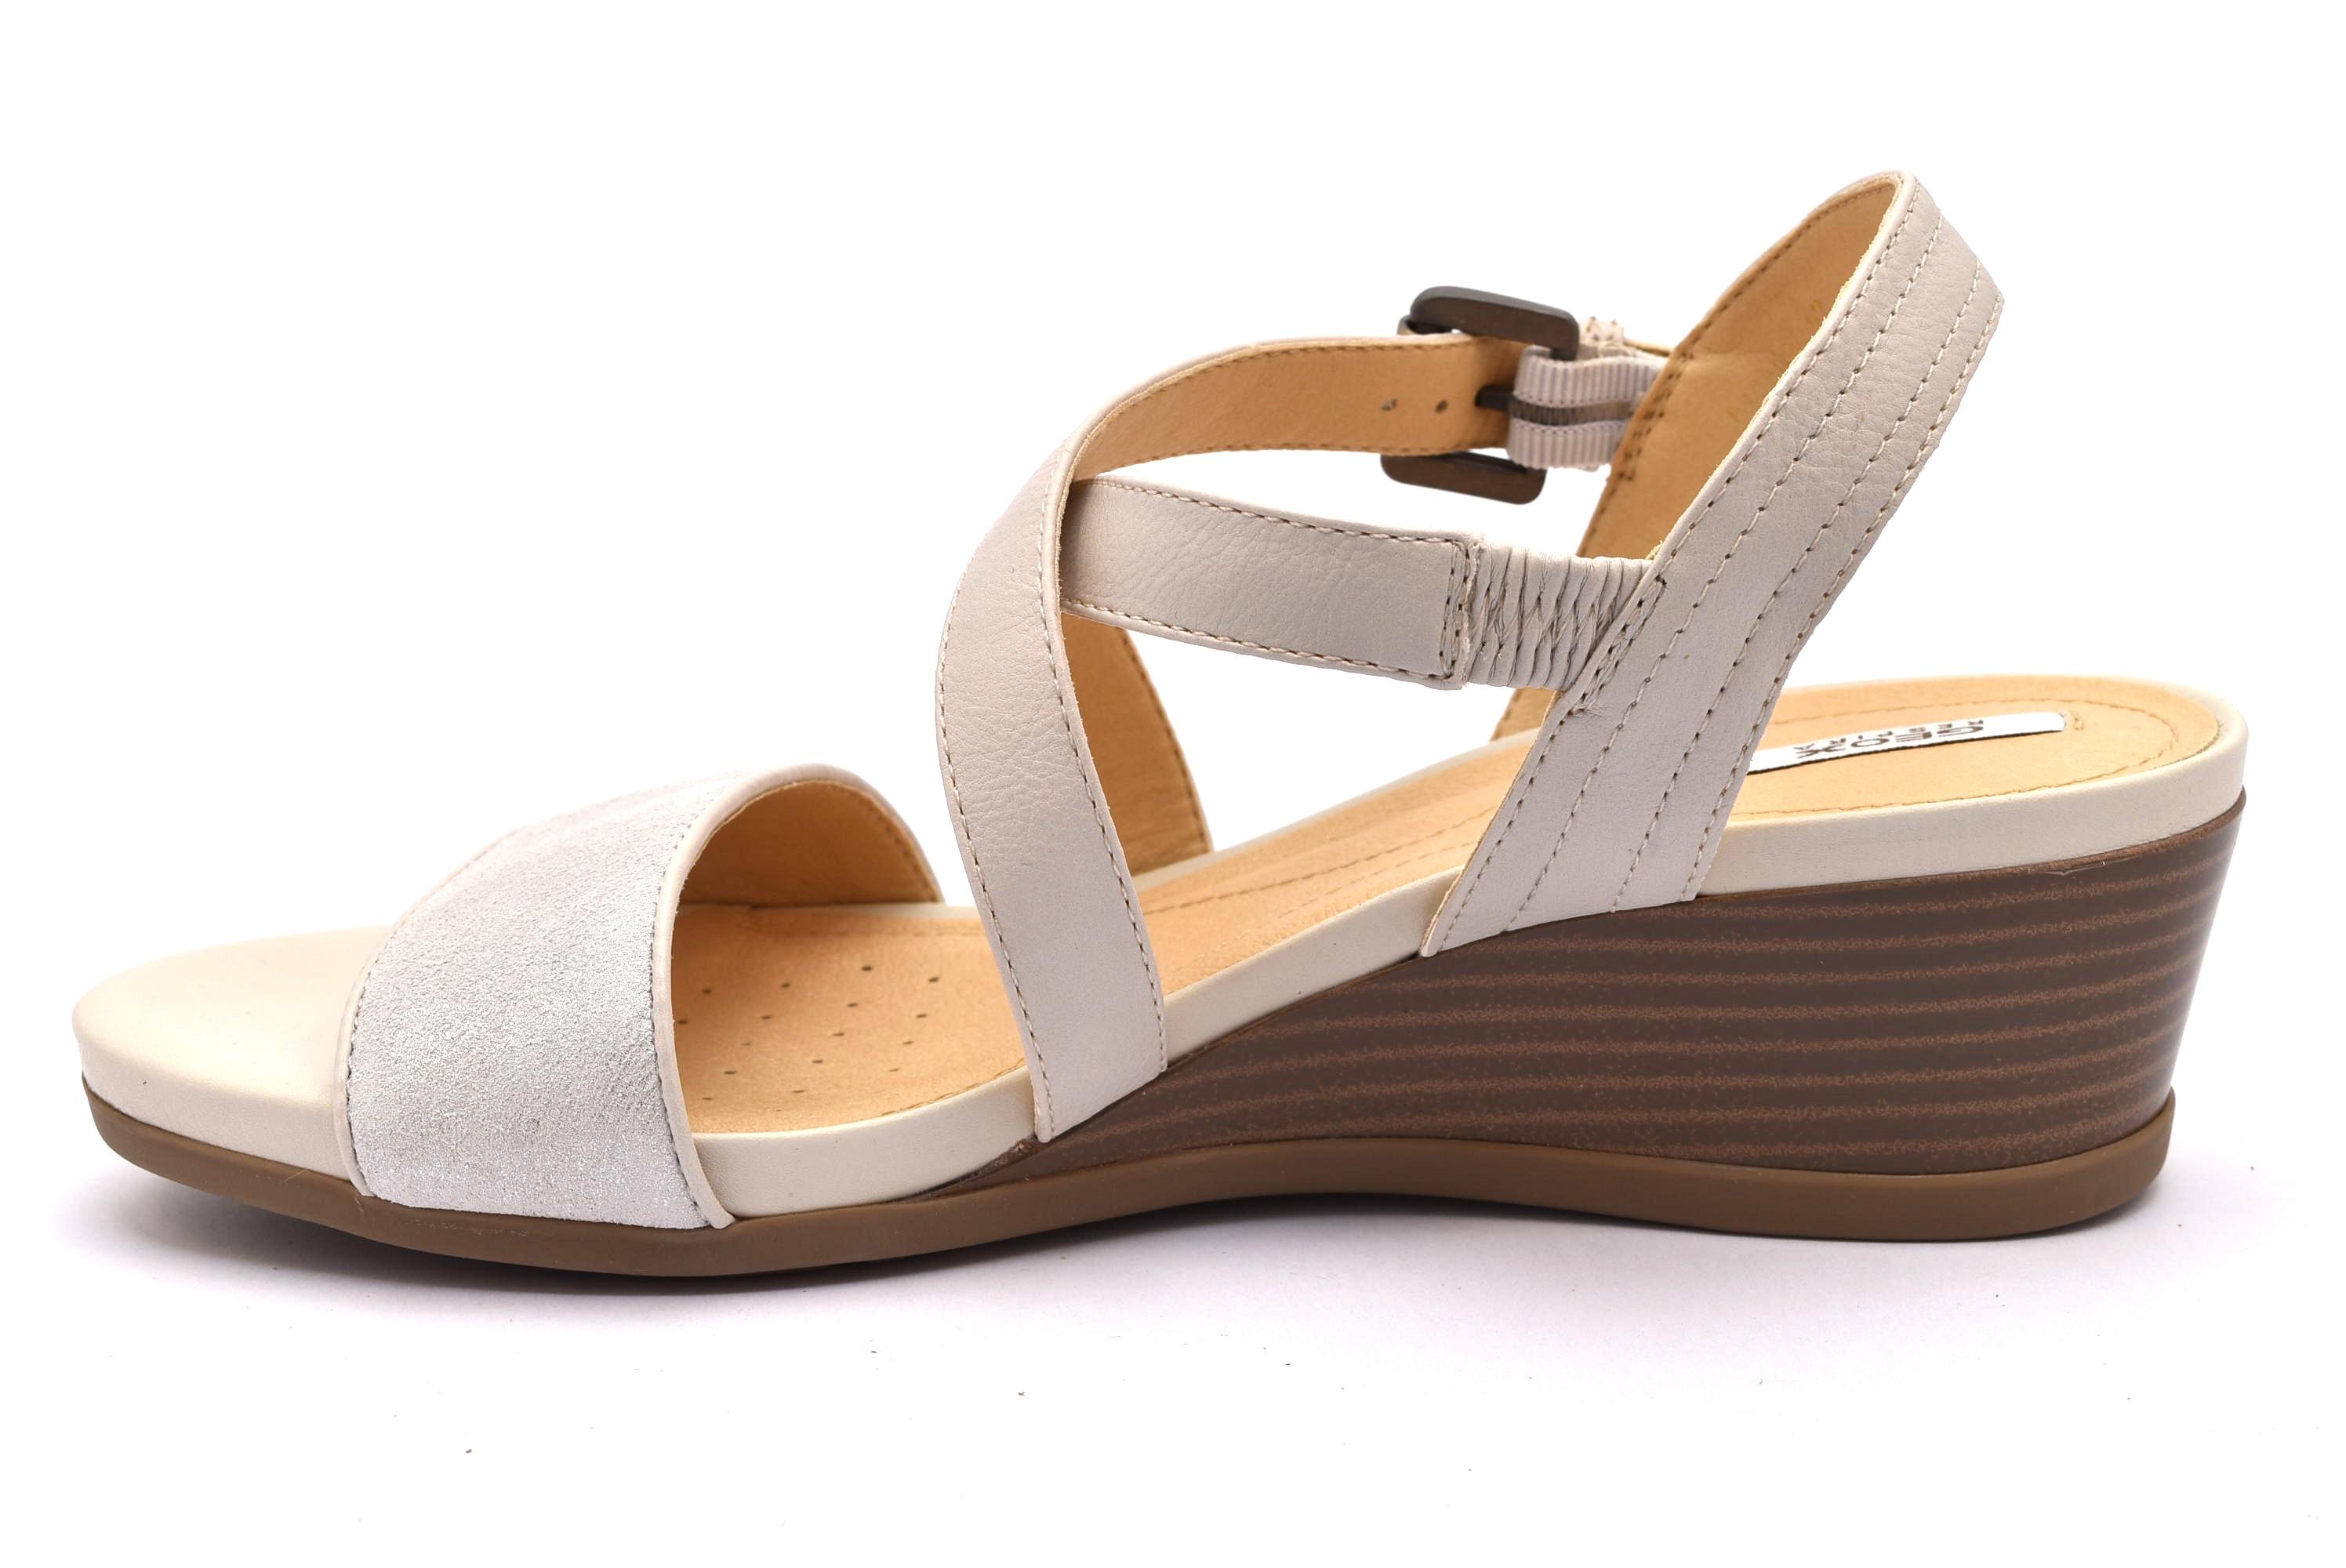 GEOX D828QA 05477 C1002 sandali donna zeppa   shoesmyfriends.it